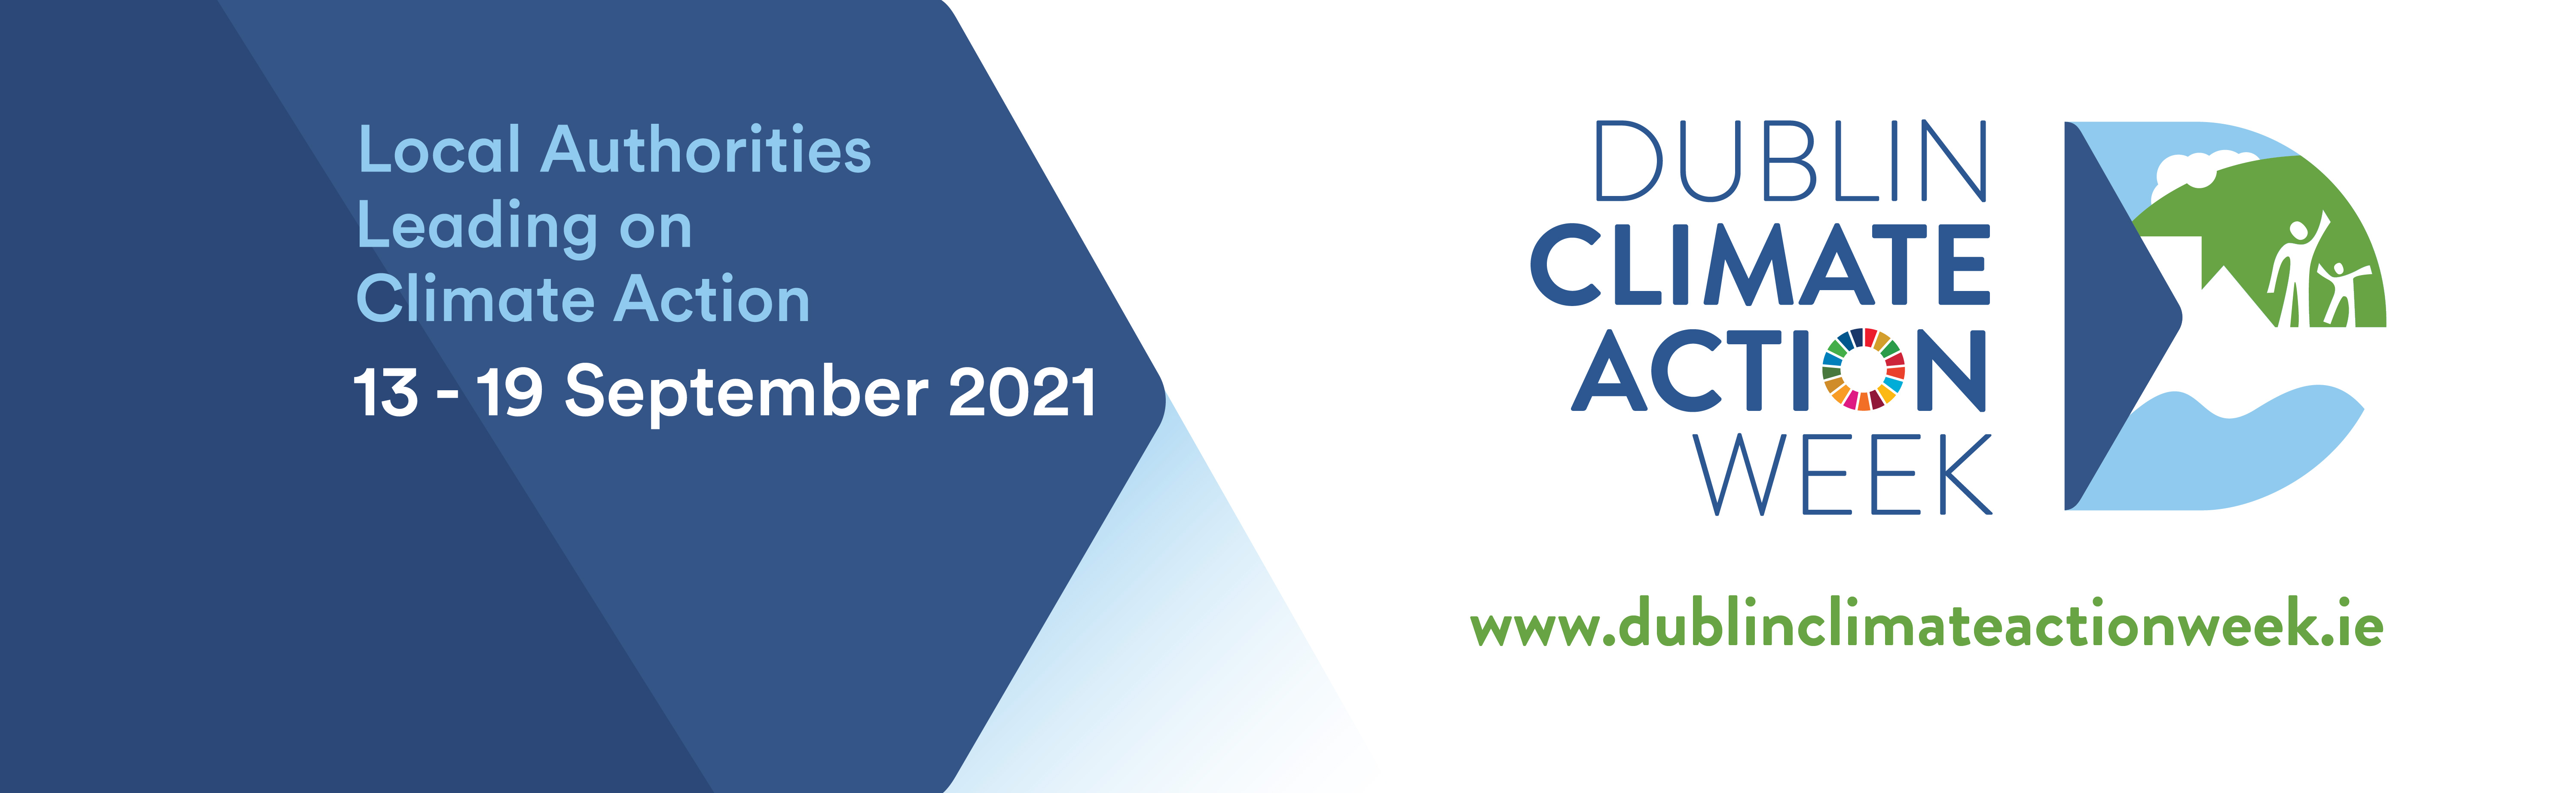 Dublin Climate Action Week 2021